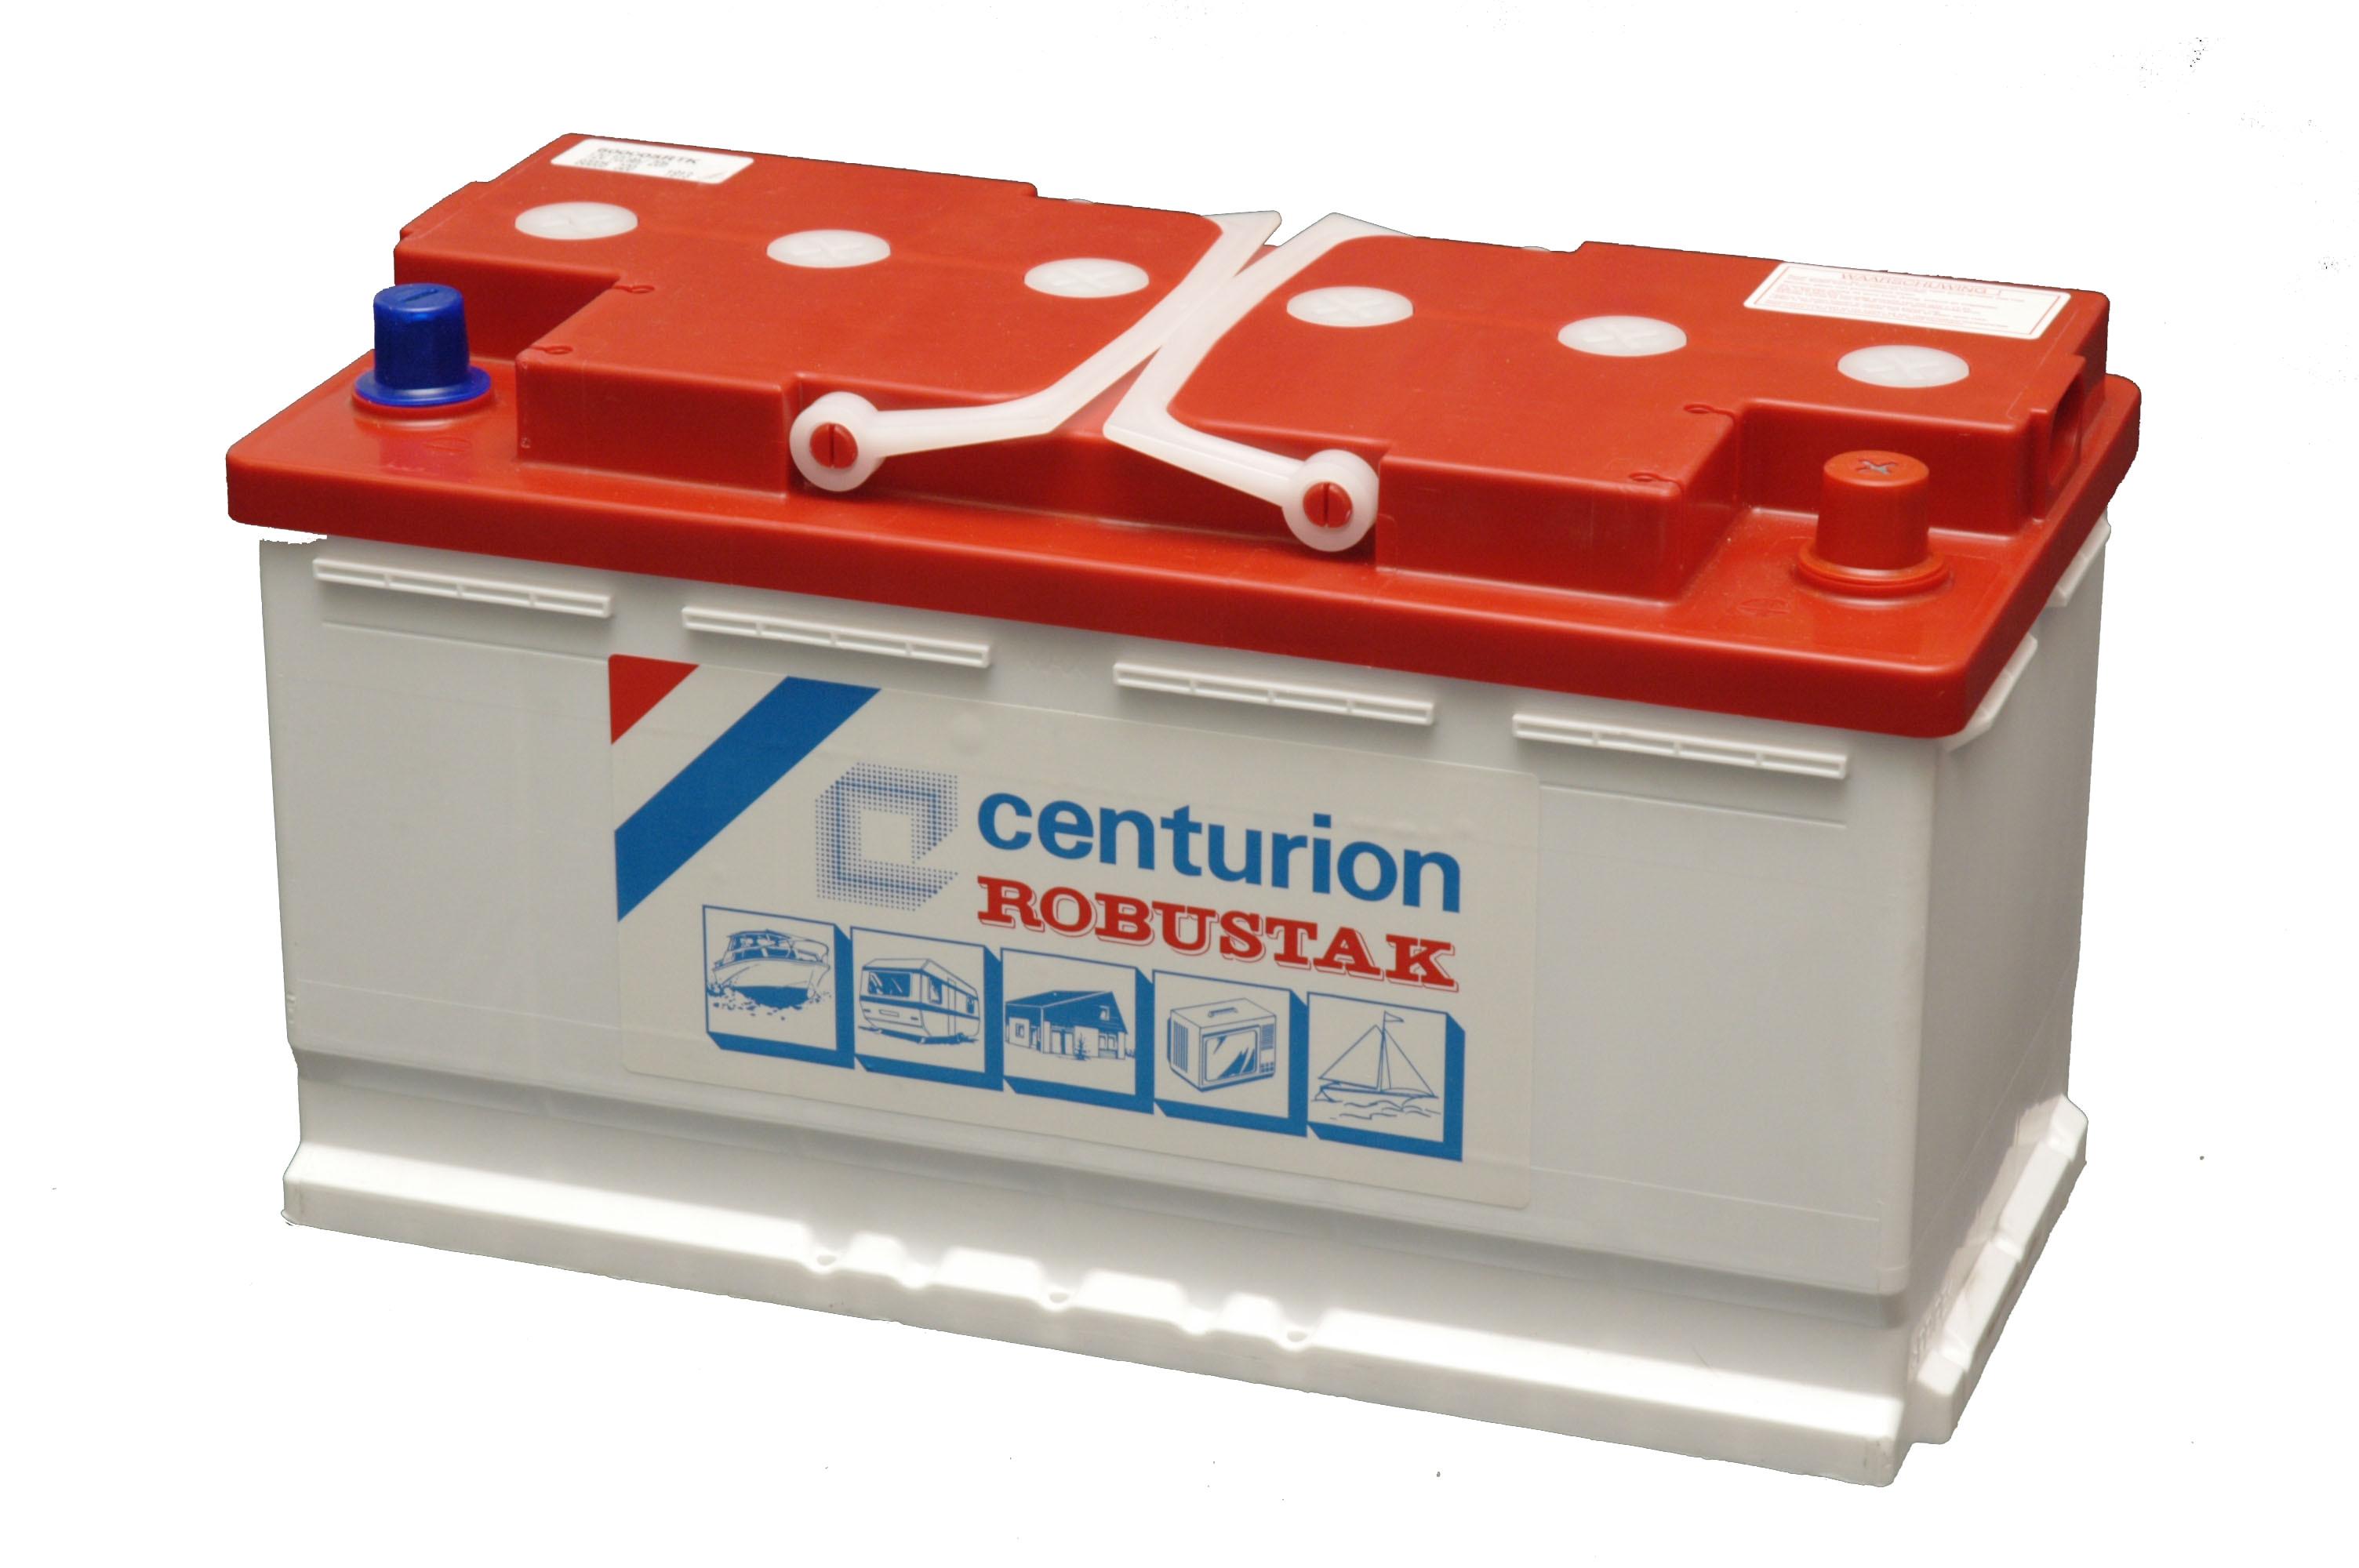 centurion-robustak-100ah-12-volt-semitractie-accu1